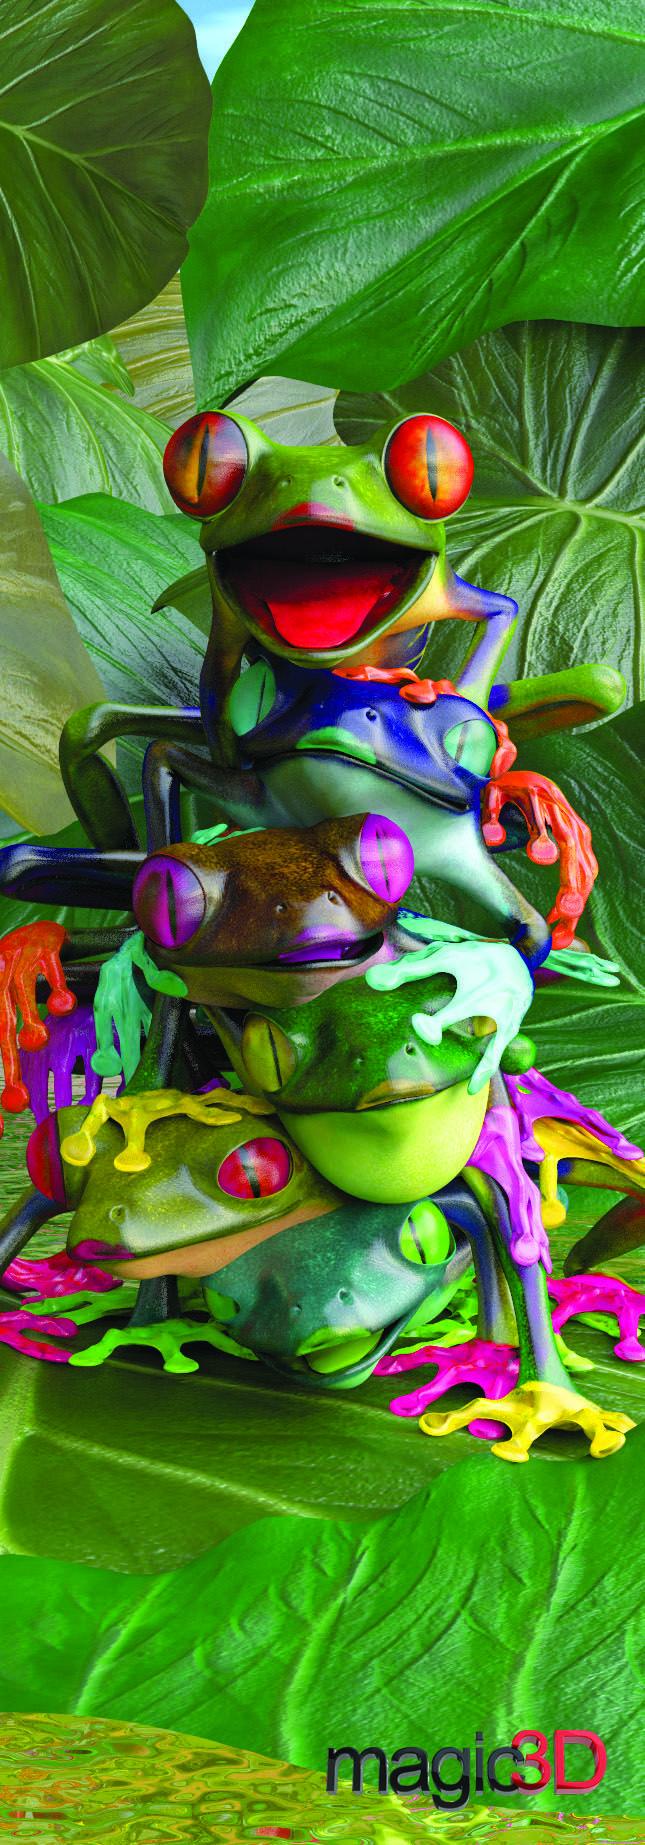 "Magic 3D Frogs - Bookmark/6"" Ruler #019"